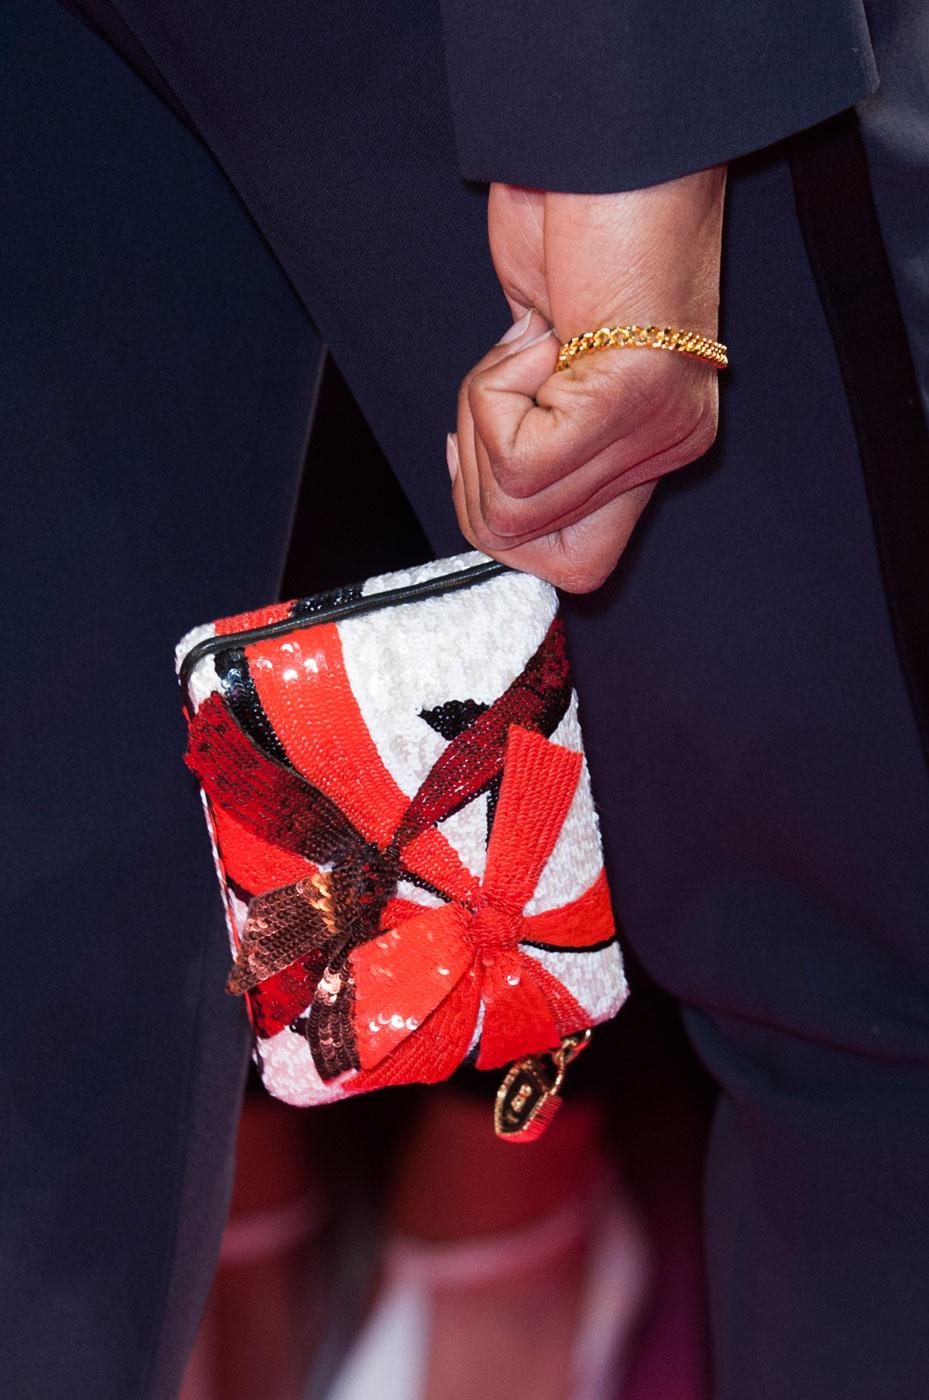 Schiaparelli-fashion-runway-show-close-ups-haute-couture-paris-spring-summer-2015-the-impression-19